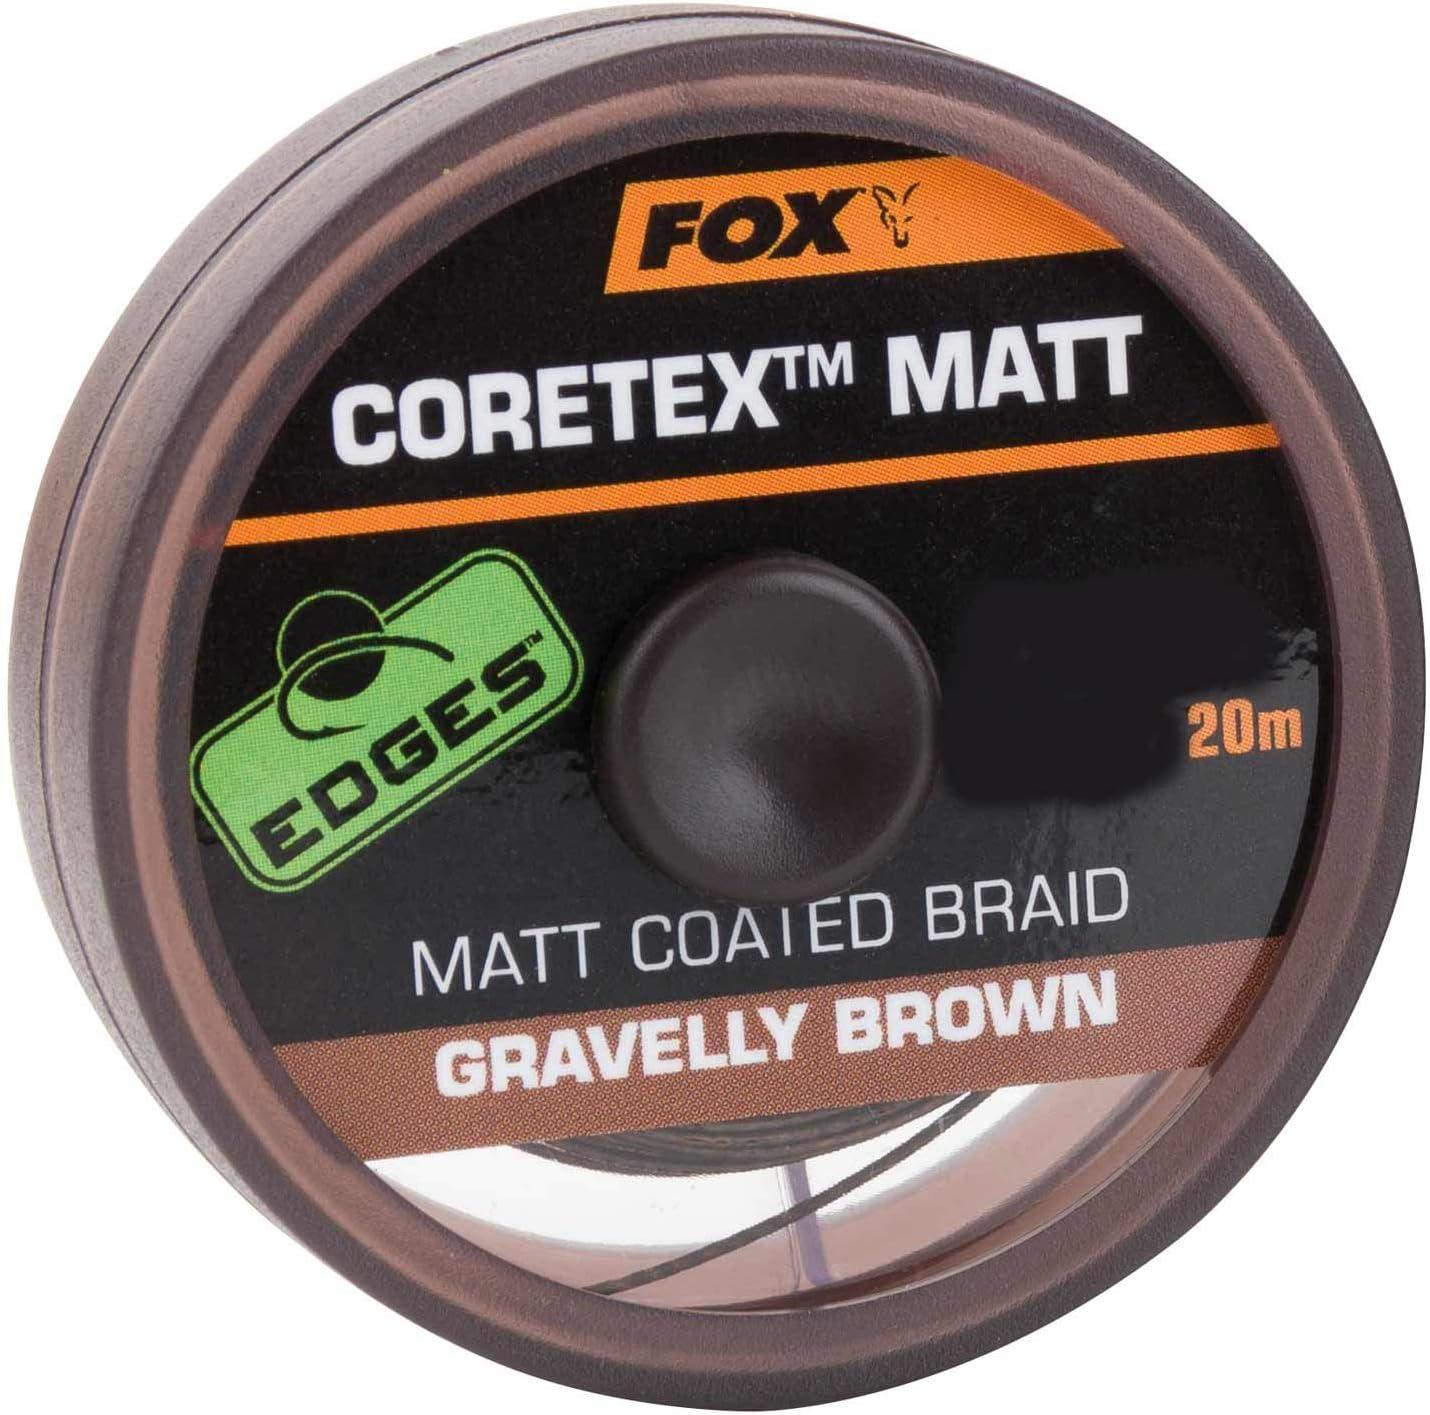 Tragkraft:35lbs//15.9kg FOX Edge Matt Coretex 20m Vorfachschnur Farbe:Braun